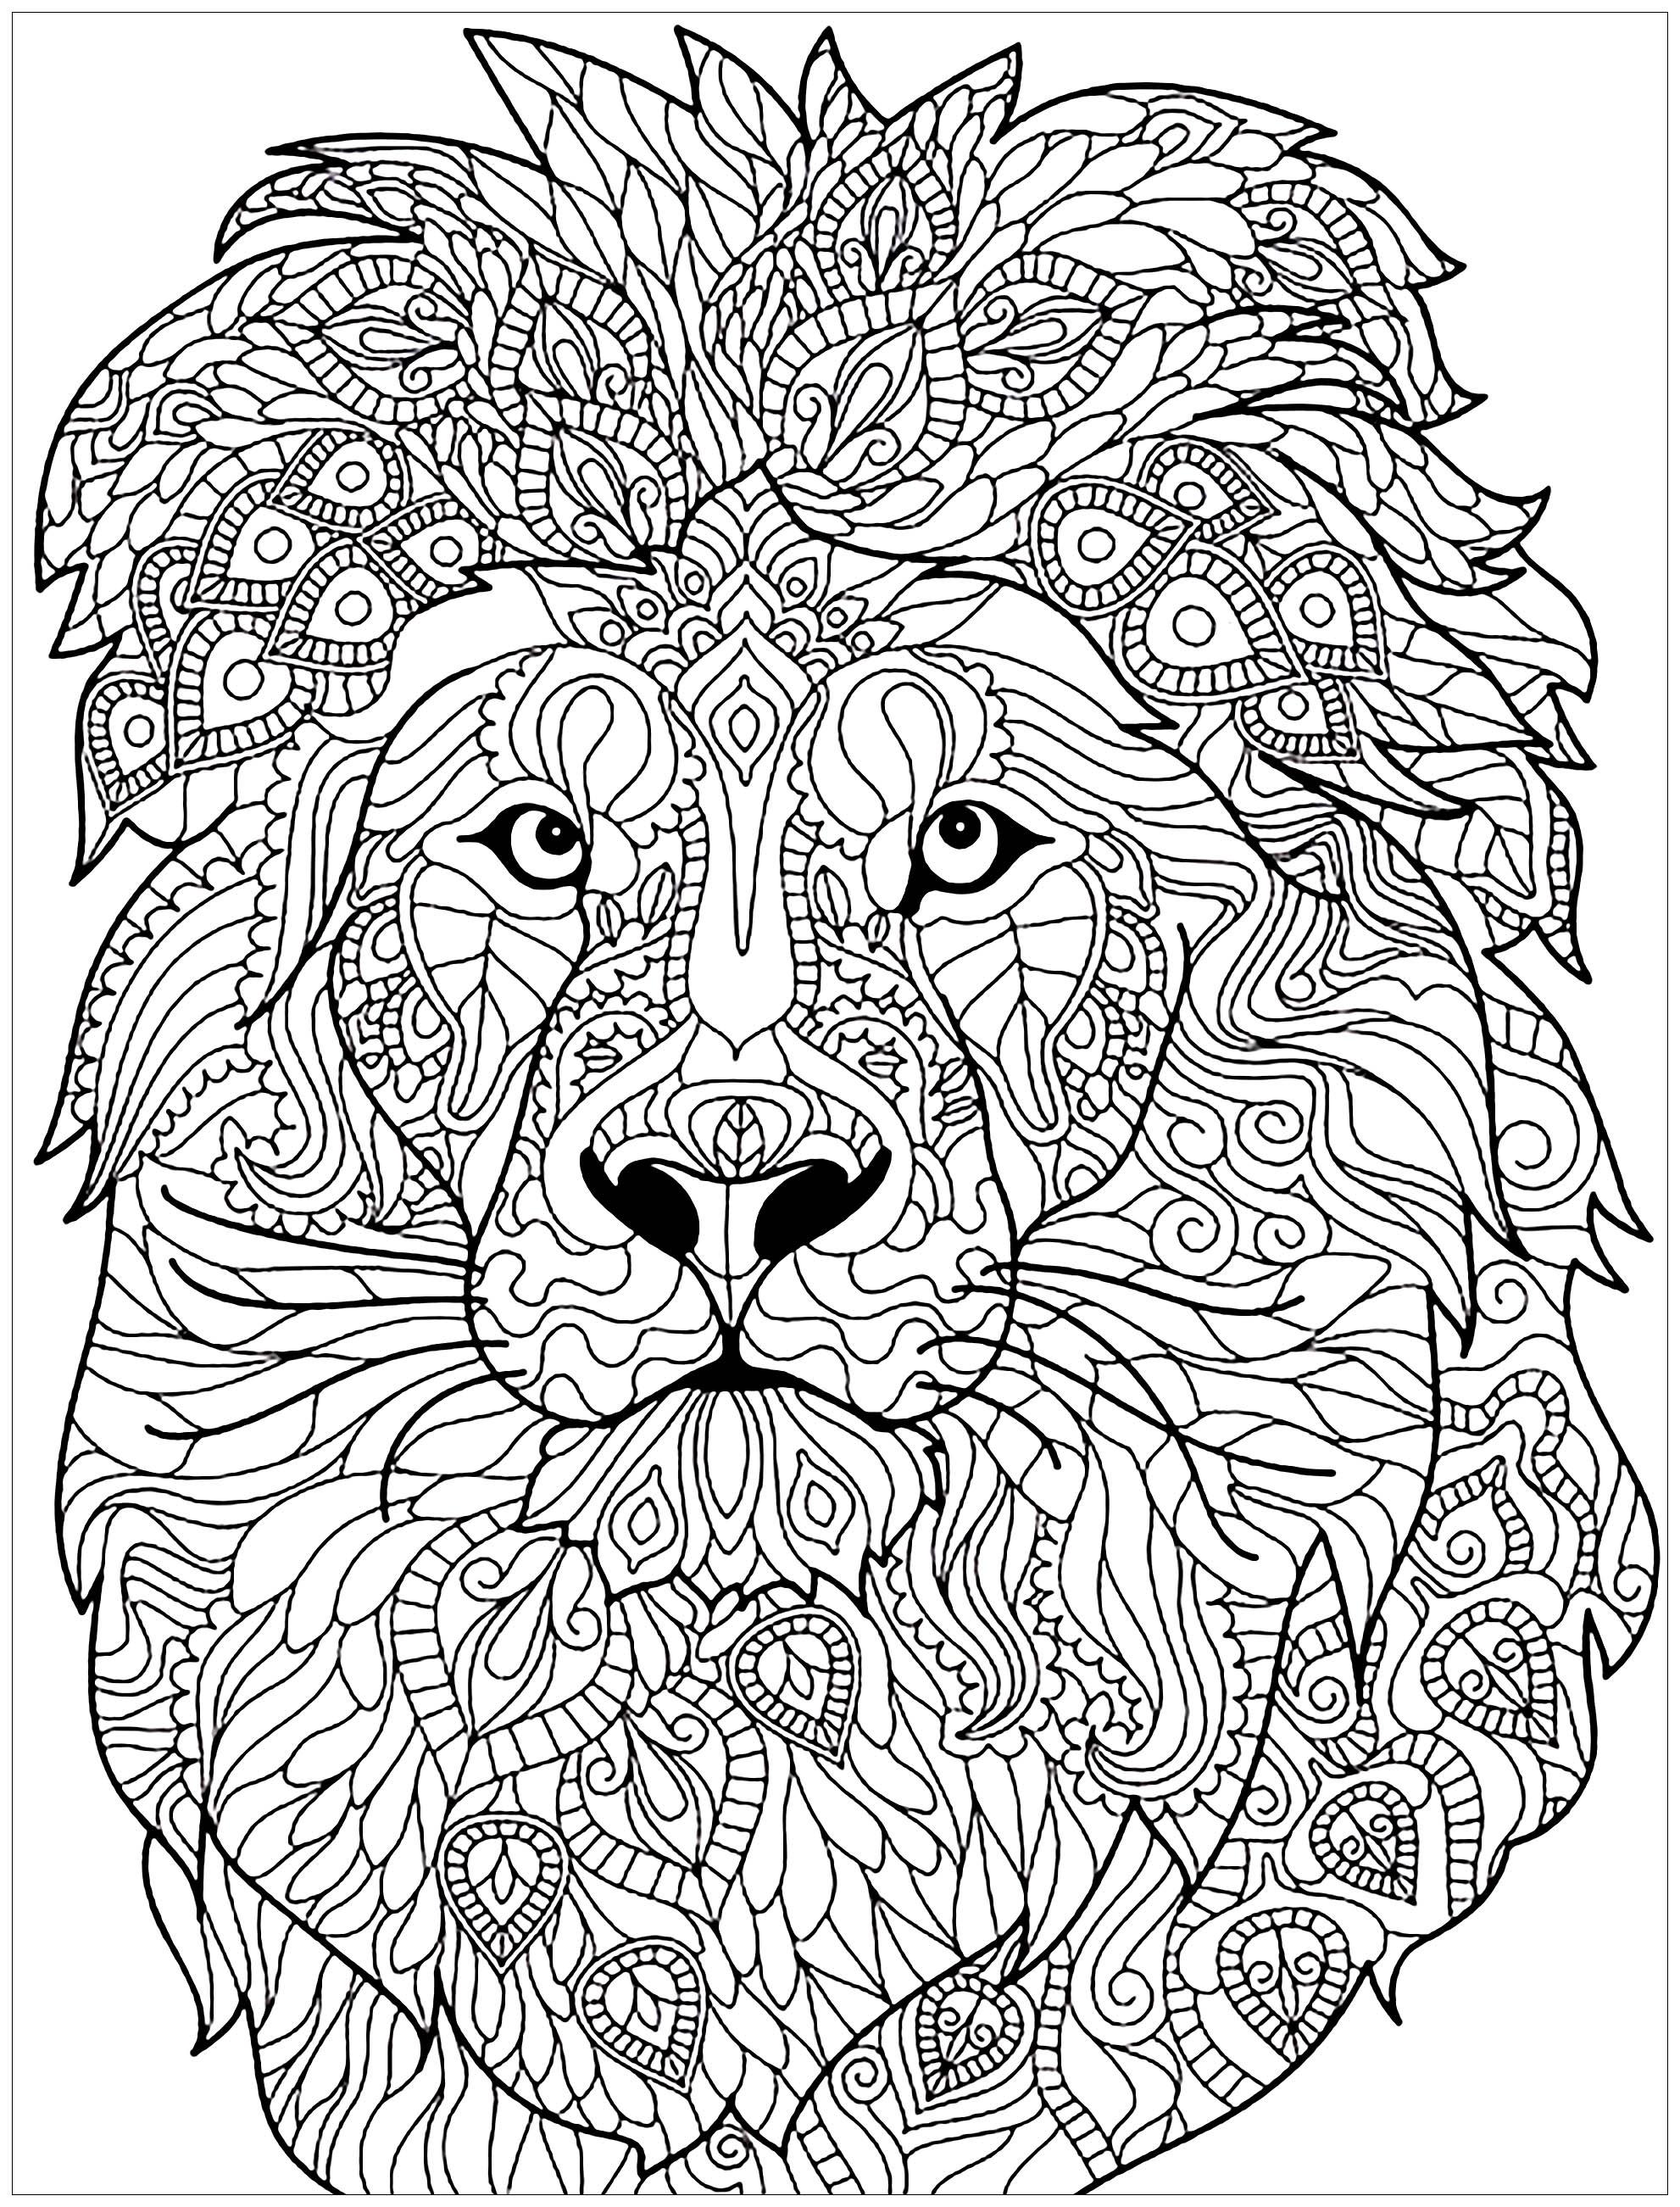 Lion Mandala Coloring Pages at GetDrawings | Free download